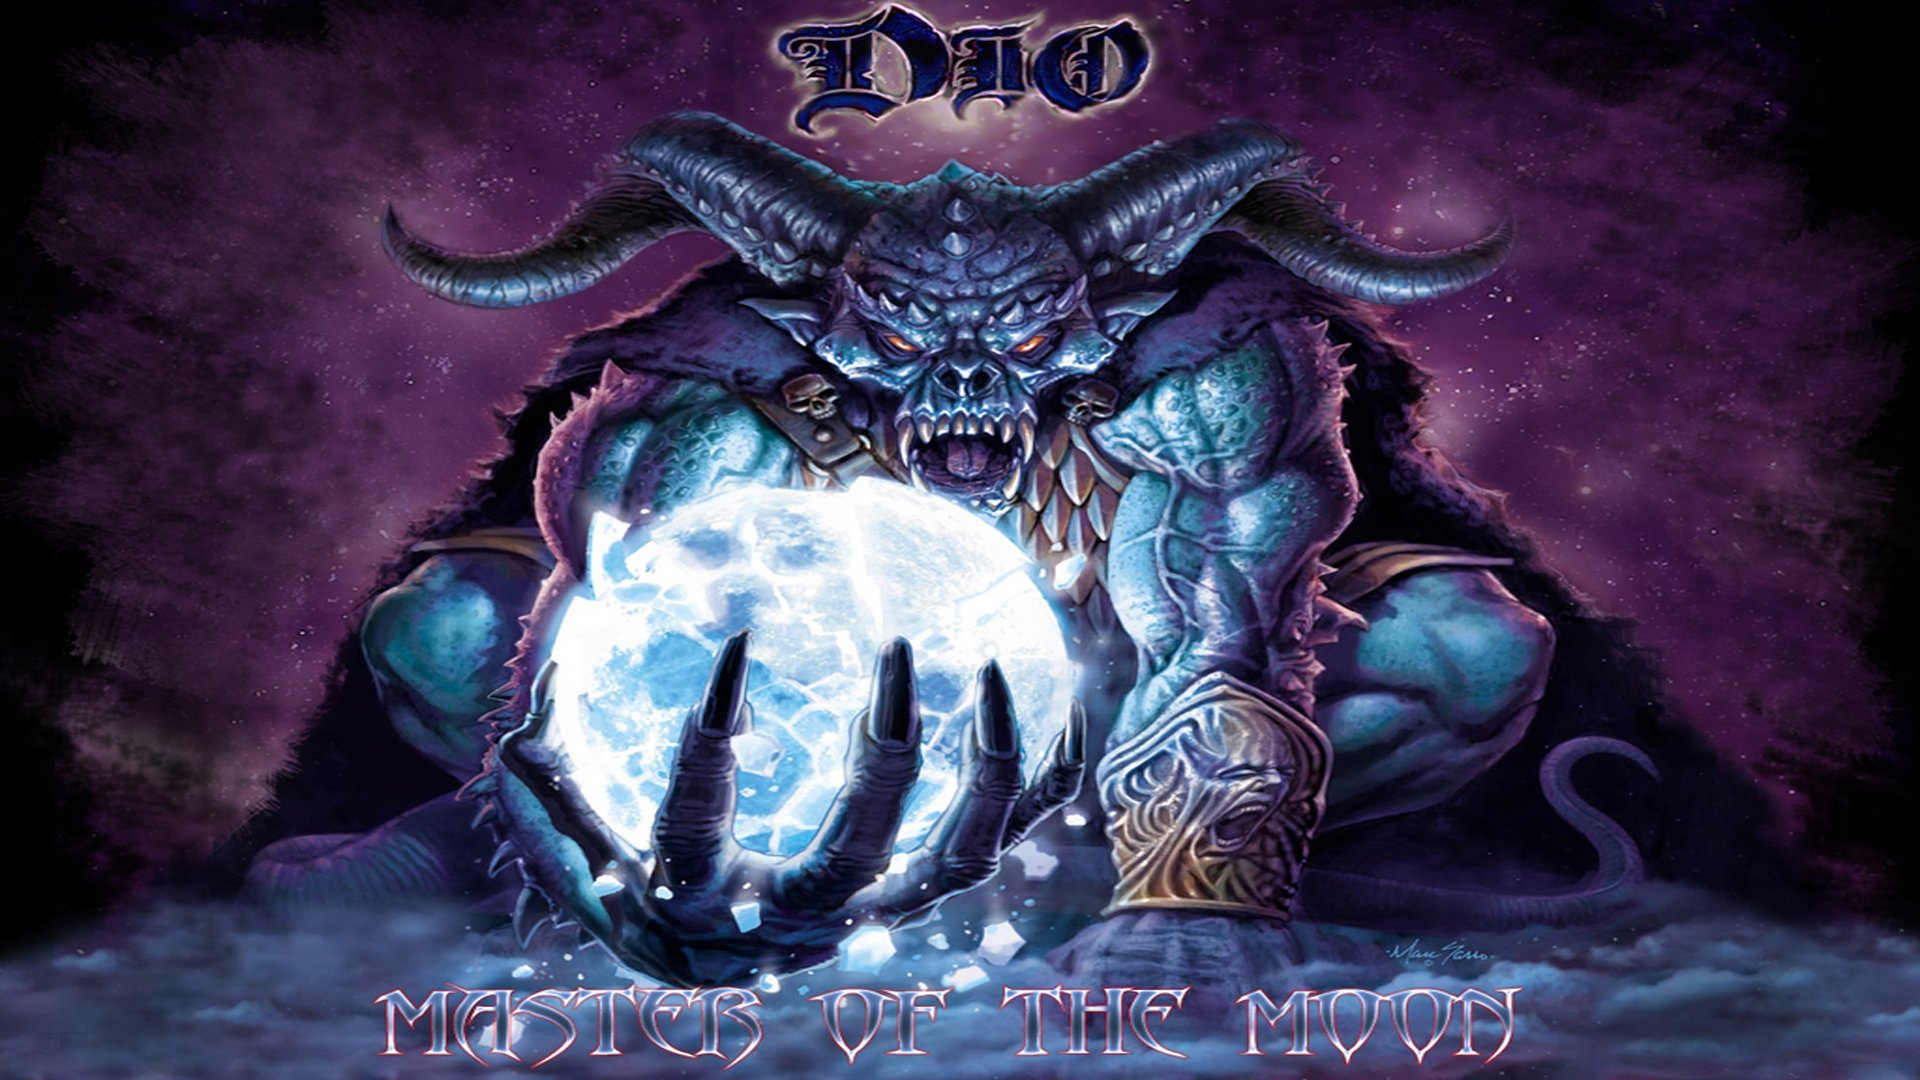 Dio HD Wallpaper Background Image 1920x1080 ID179050 1920x1080